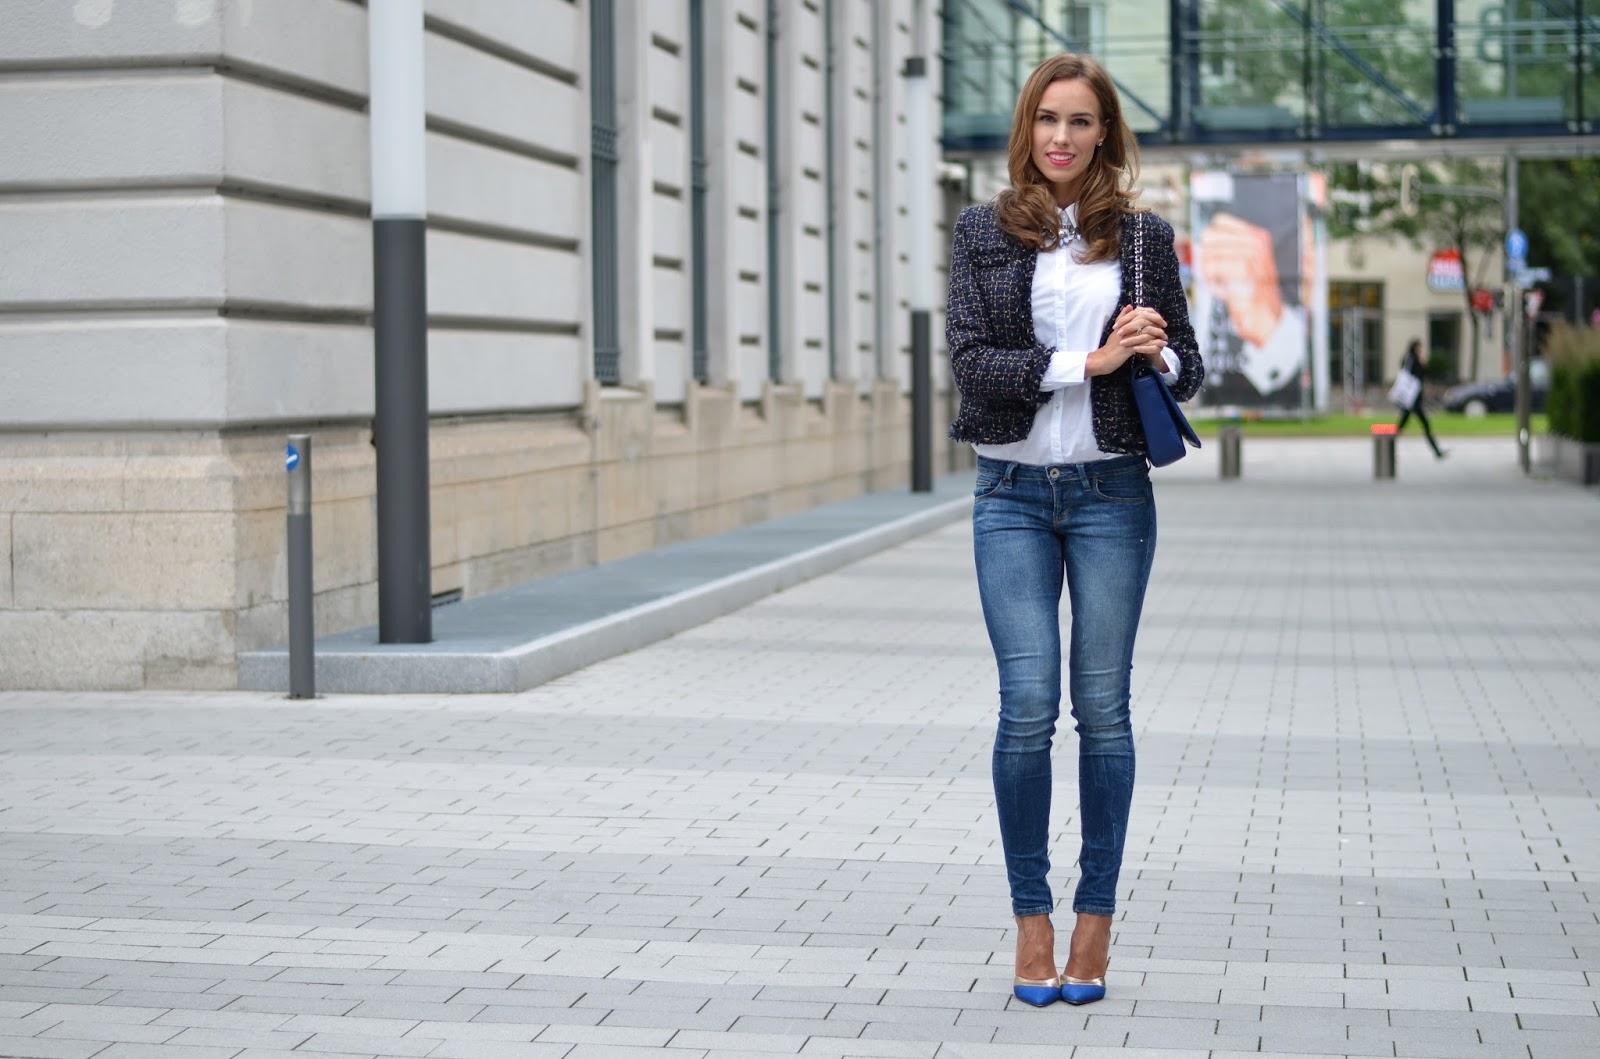 kristjaana mere munich street style fashion blogger luxury